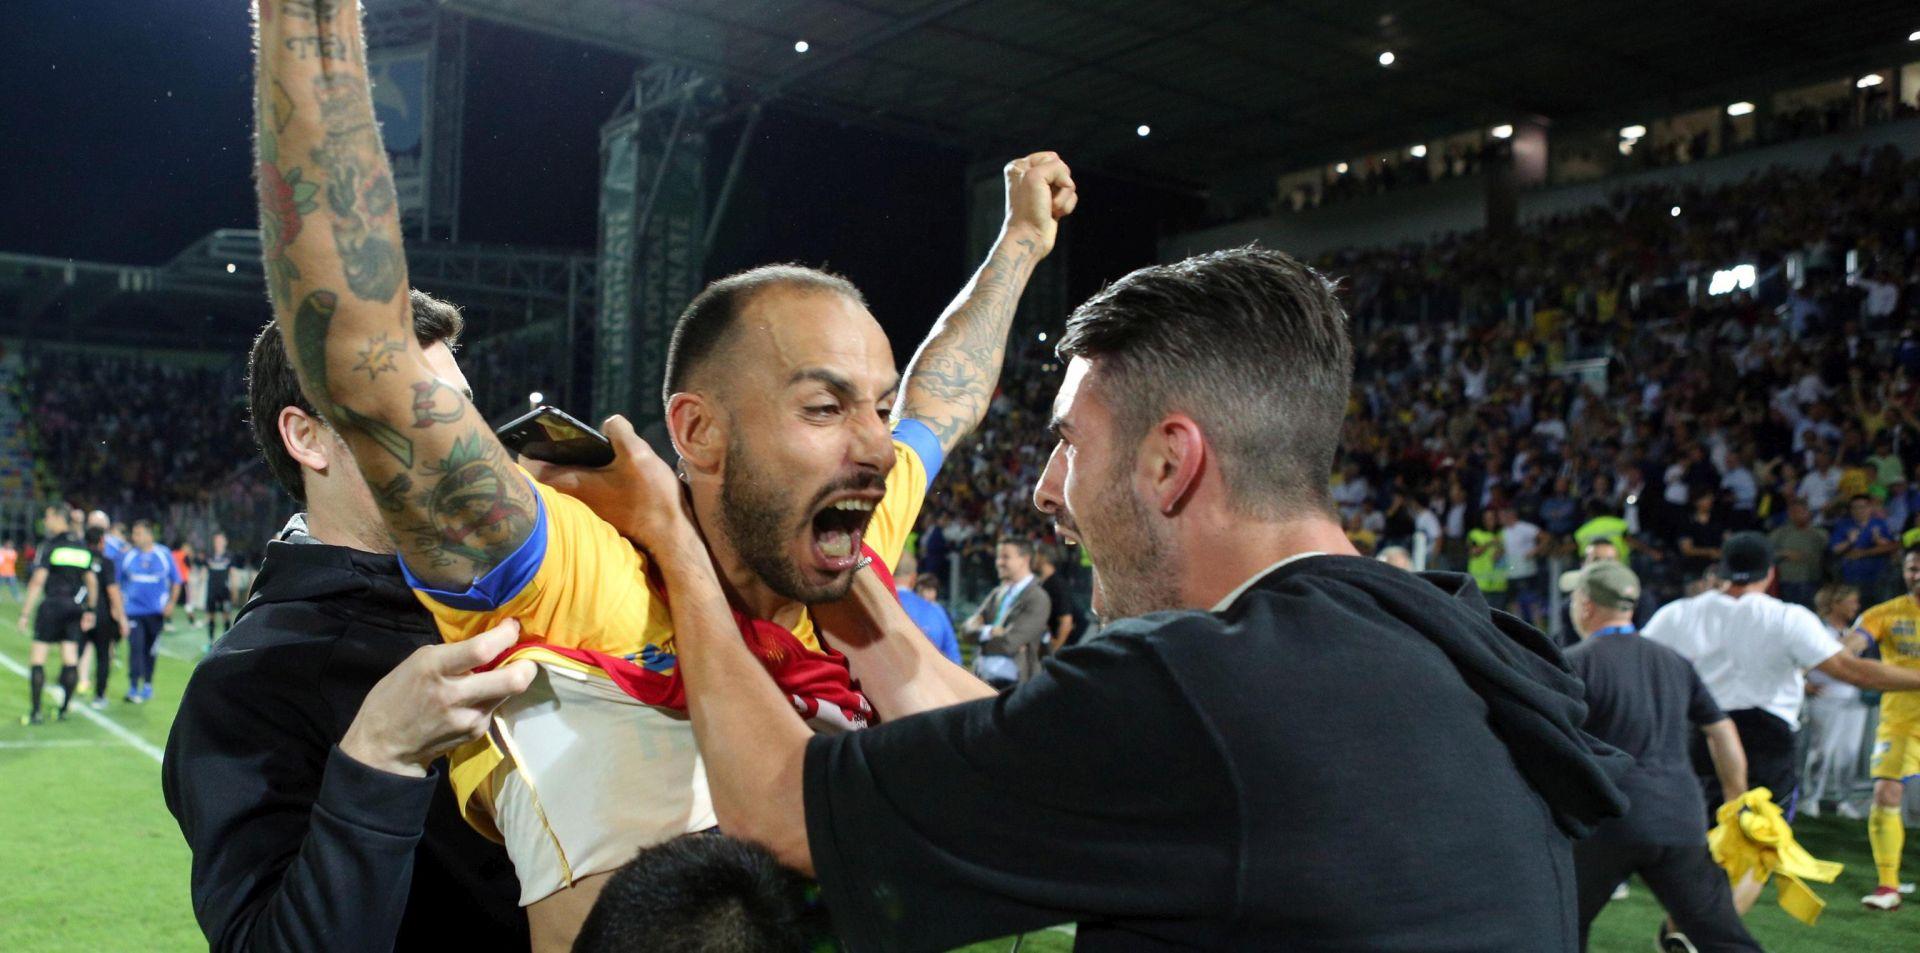 Frosinone u Serie A, Valladolid u Primeri